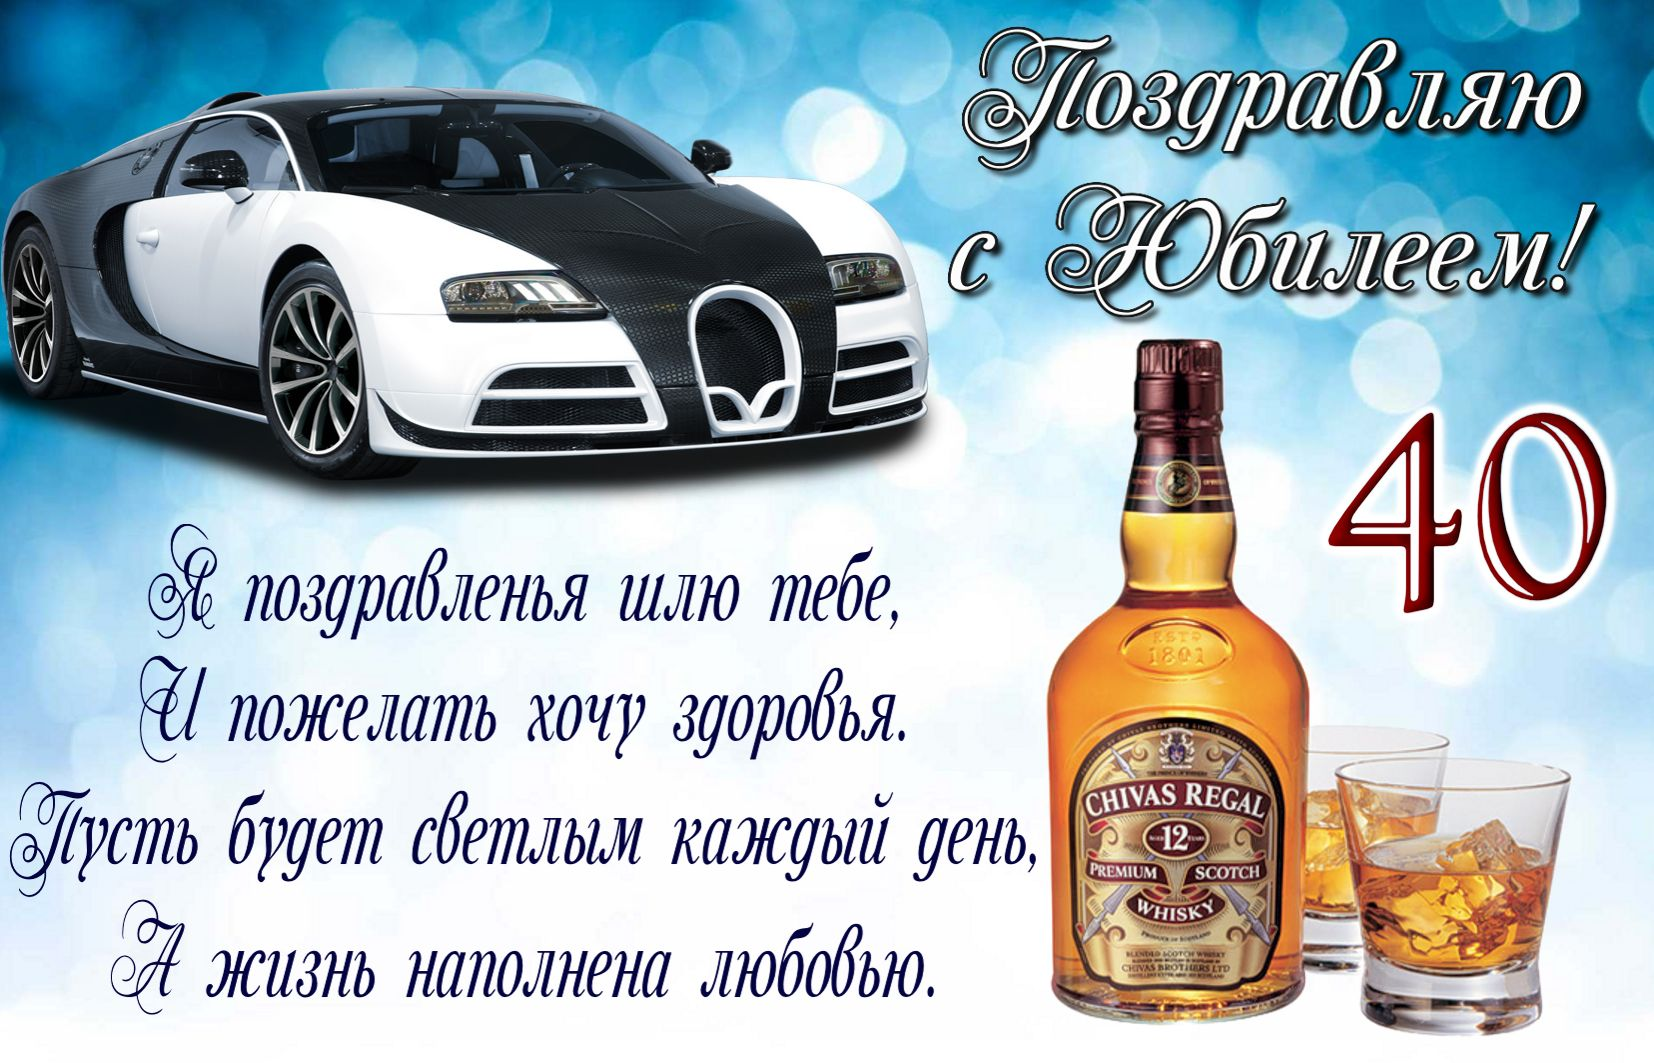 Открытка на юбилей 40 лет - пожелание мужчине с виски и машиной